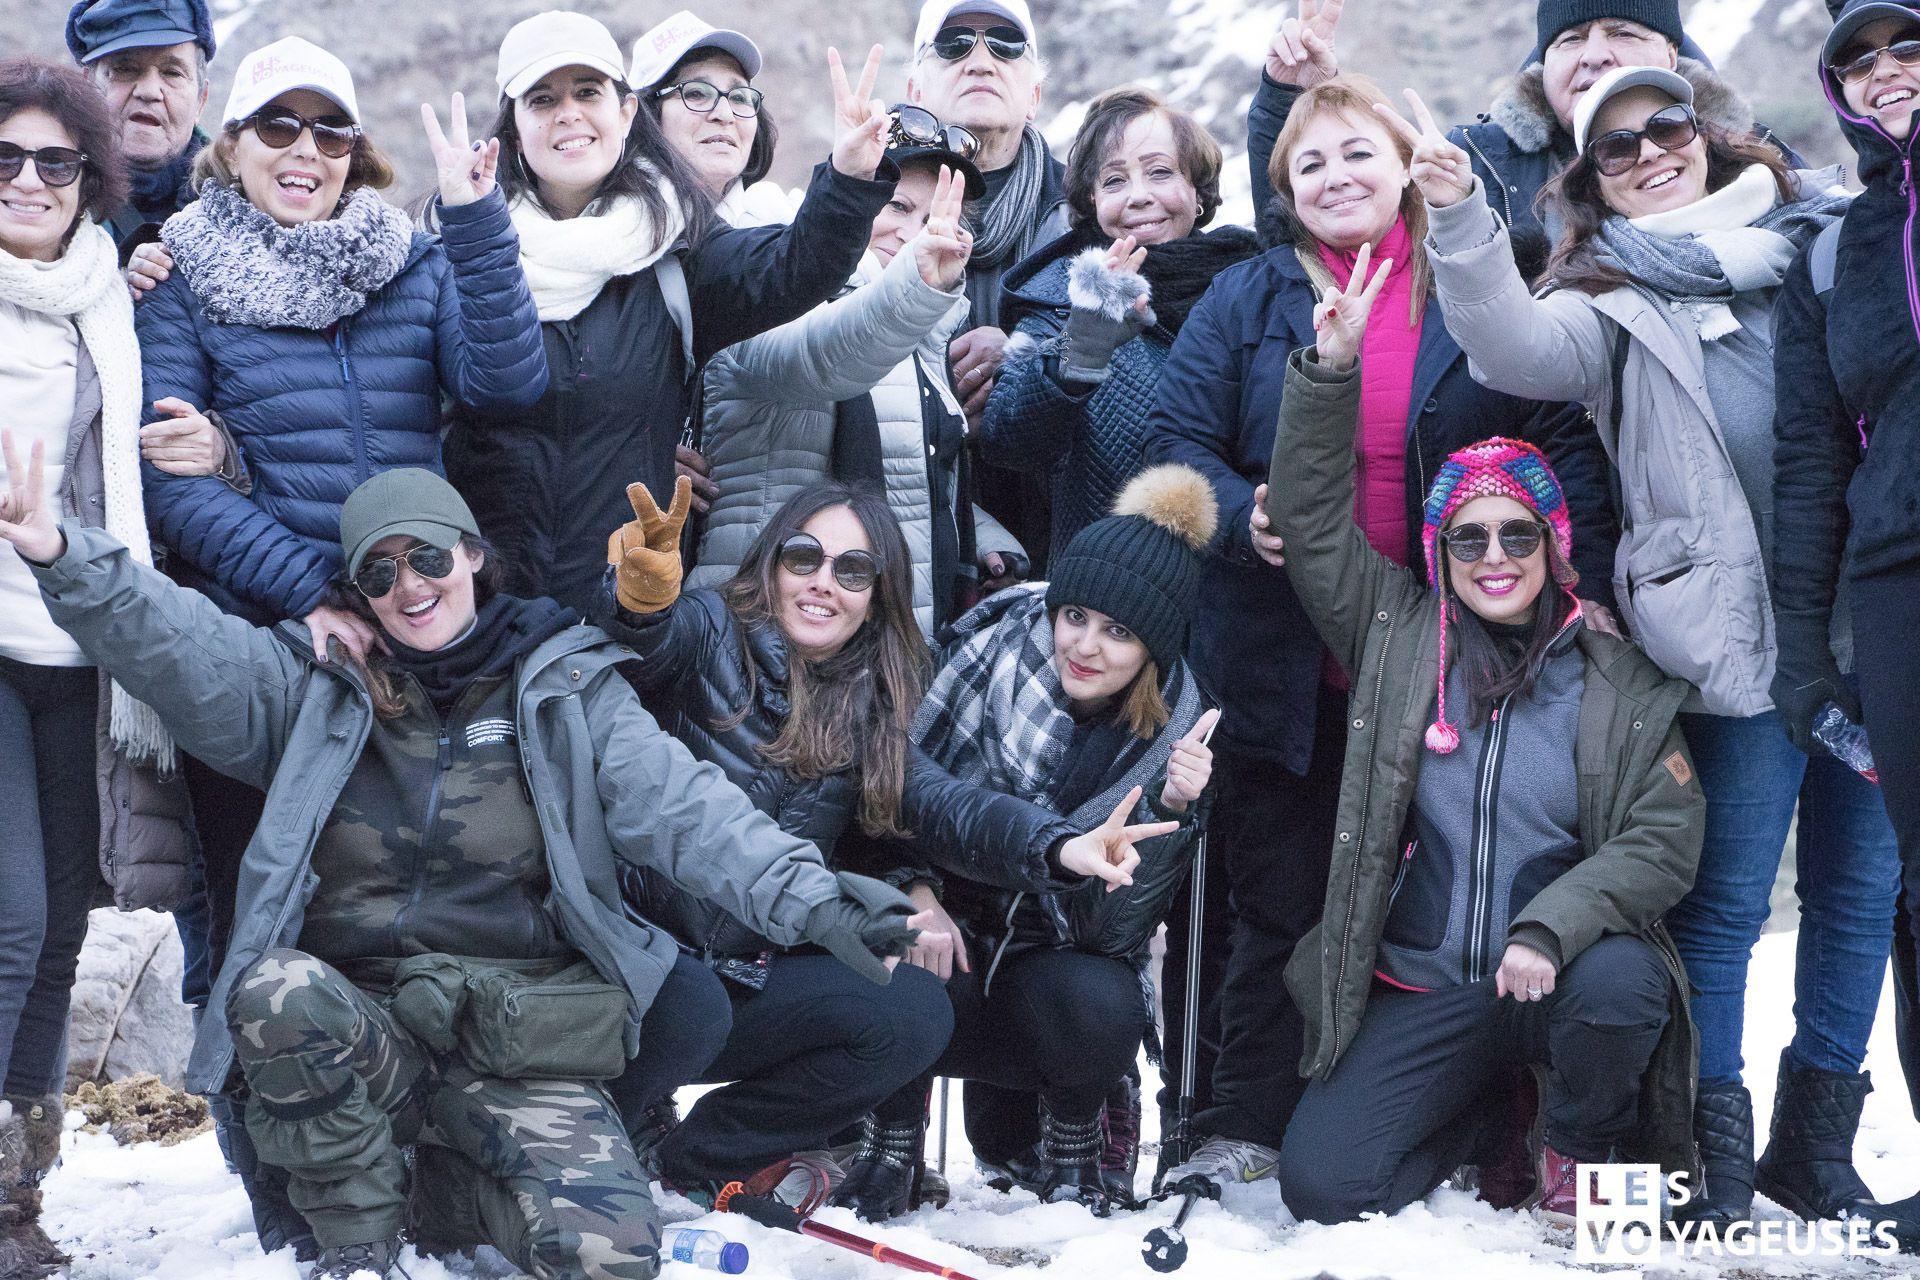 Les-voyageuses-maroc-imlil-hiver-00090